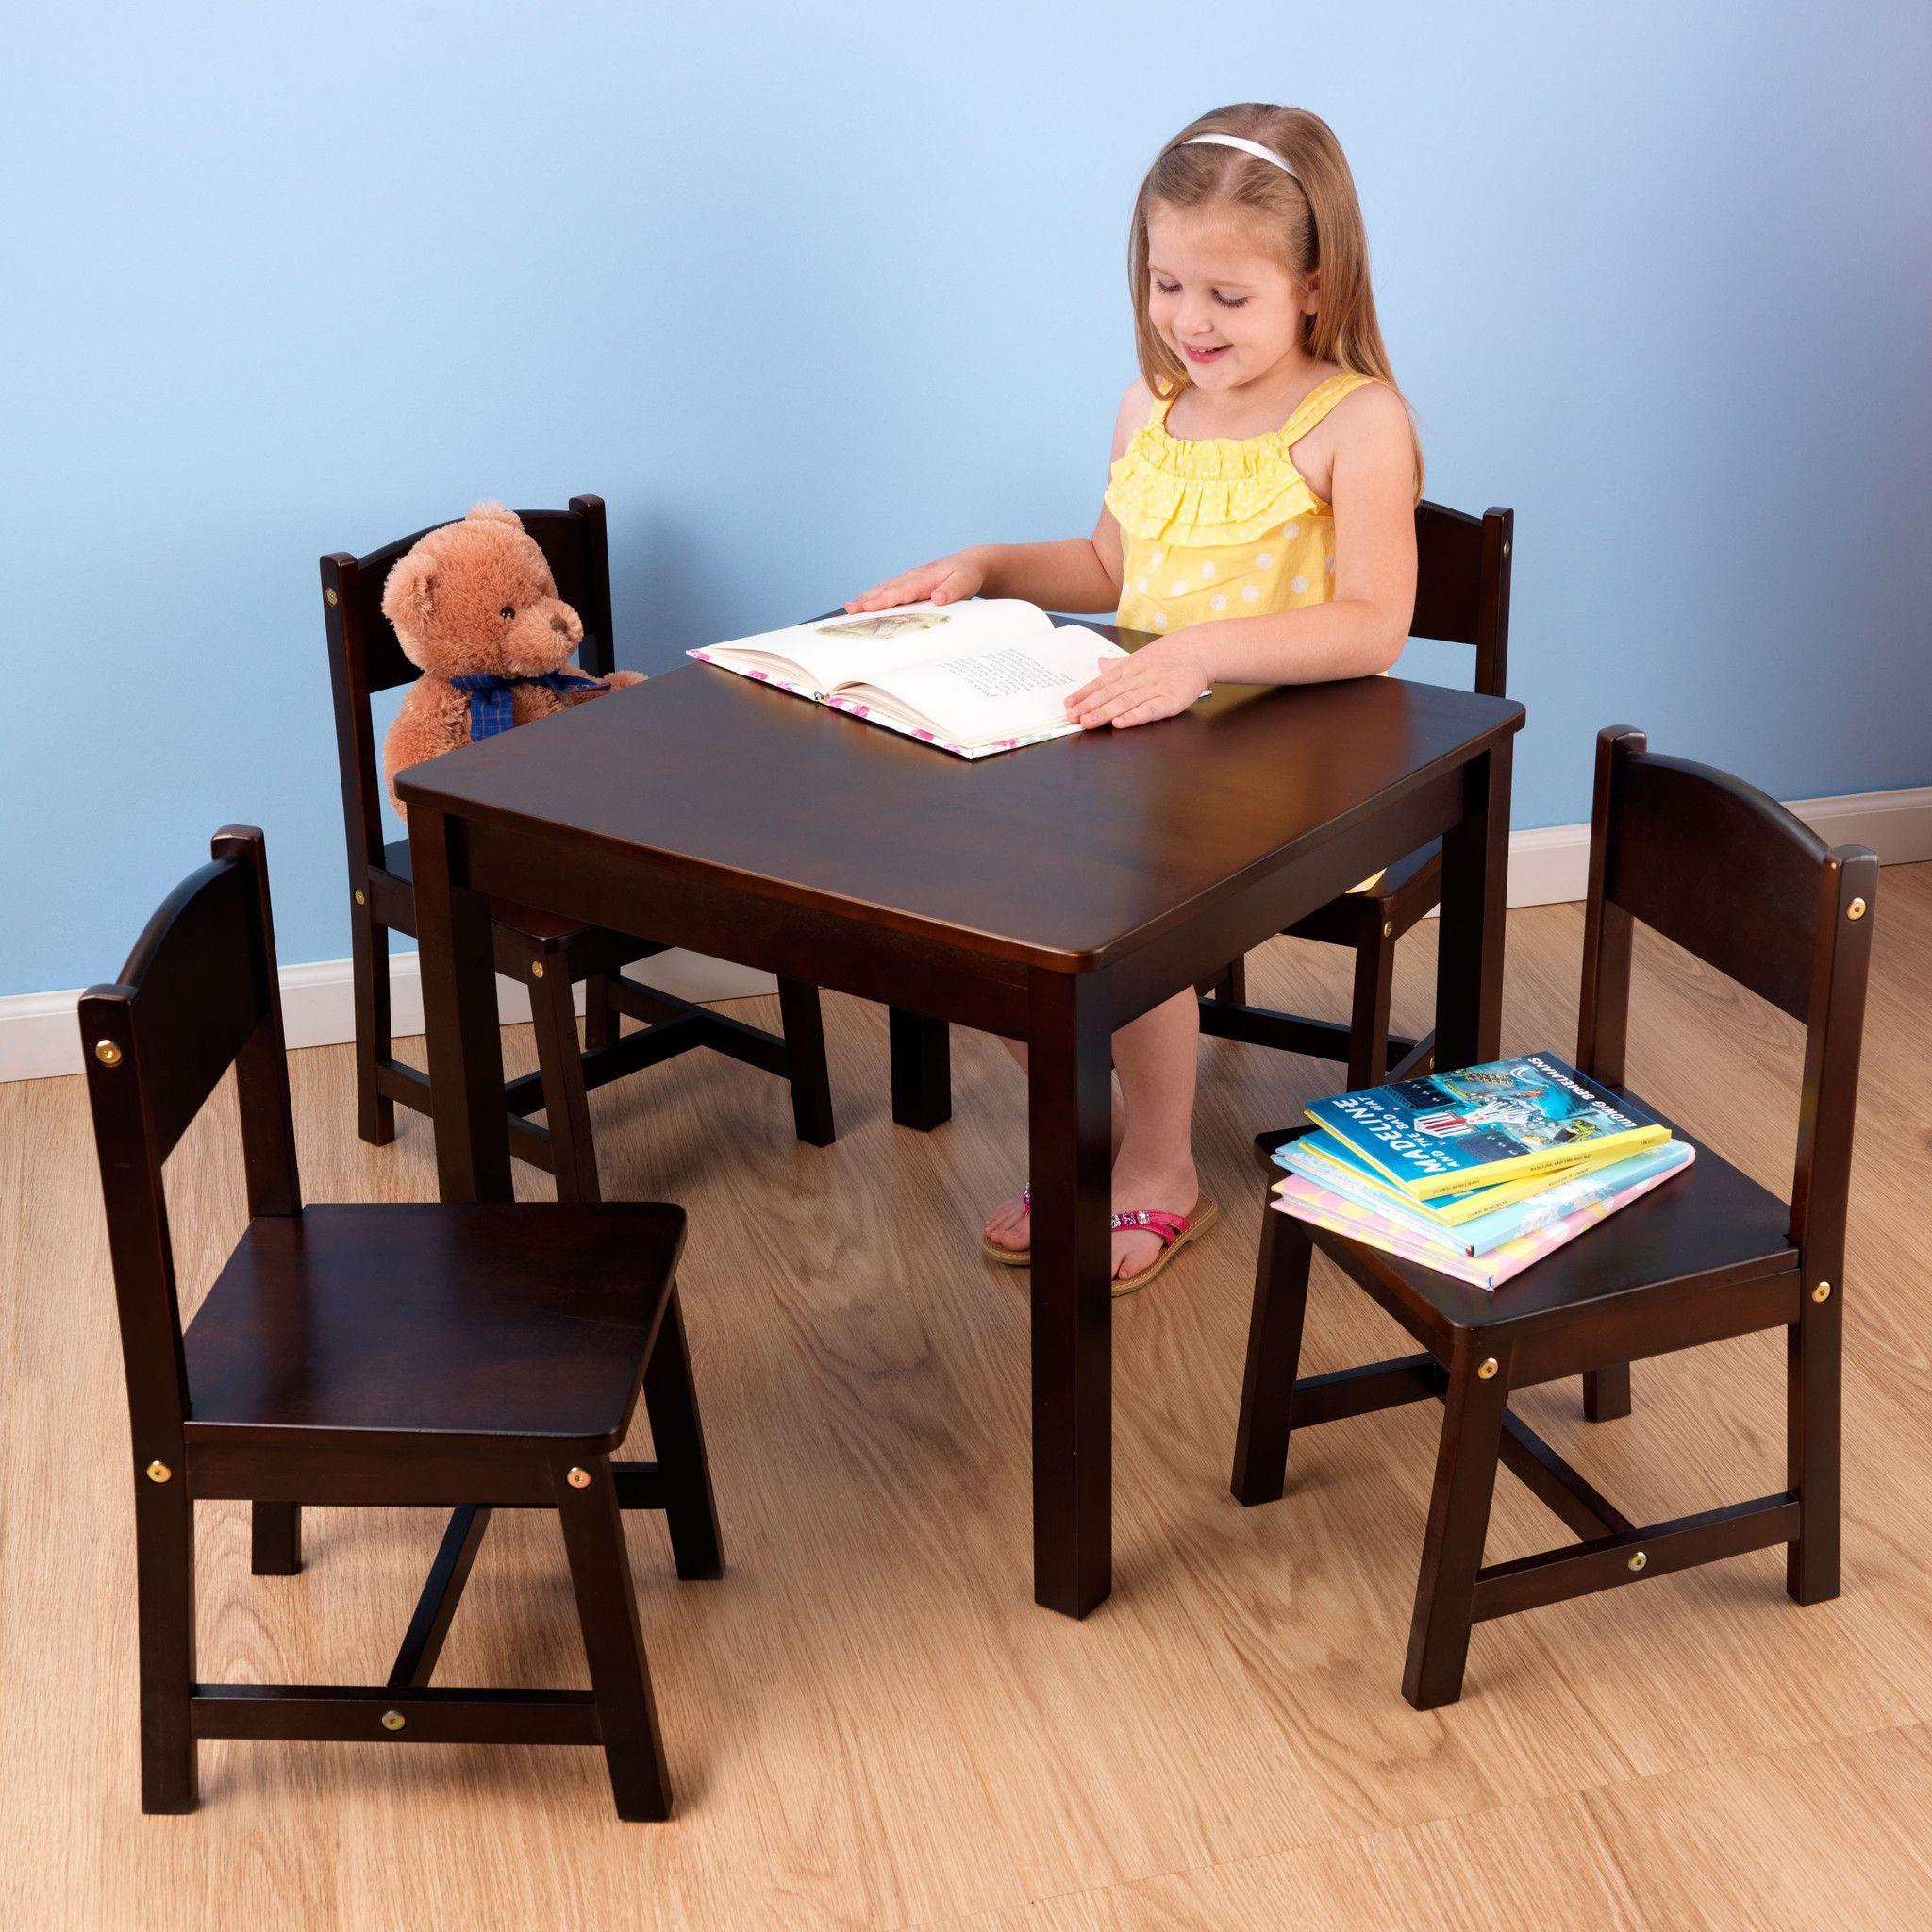 KidKraft Farmhouse Table \u0026 4 Chairs Espresso - 21453  sc 1 st  Pinterest & Kid Kraft Farmhouse Table \u0026 4 Chairs Espresso - 21453 | Home Sweet ...